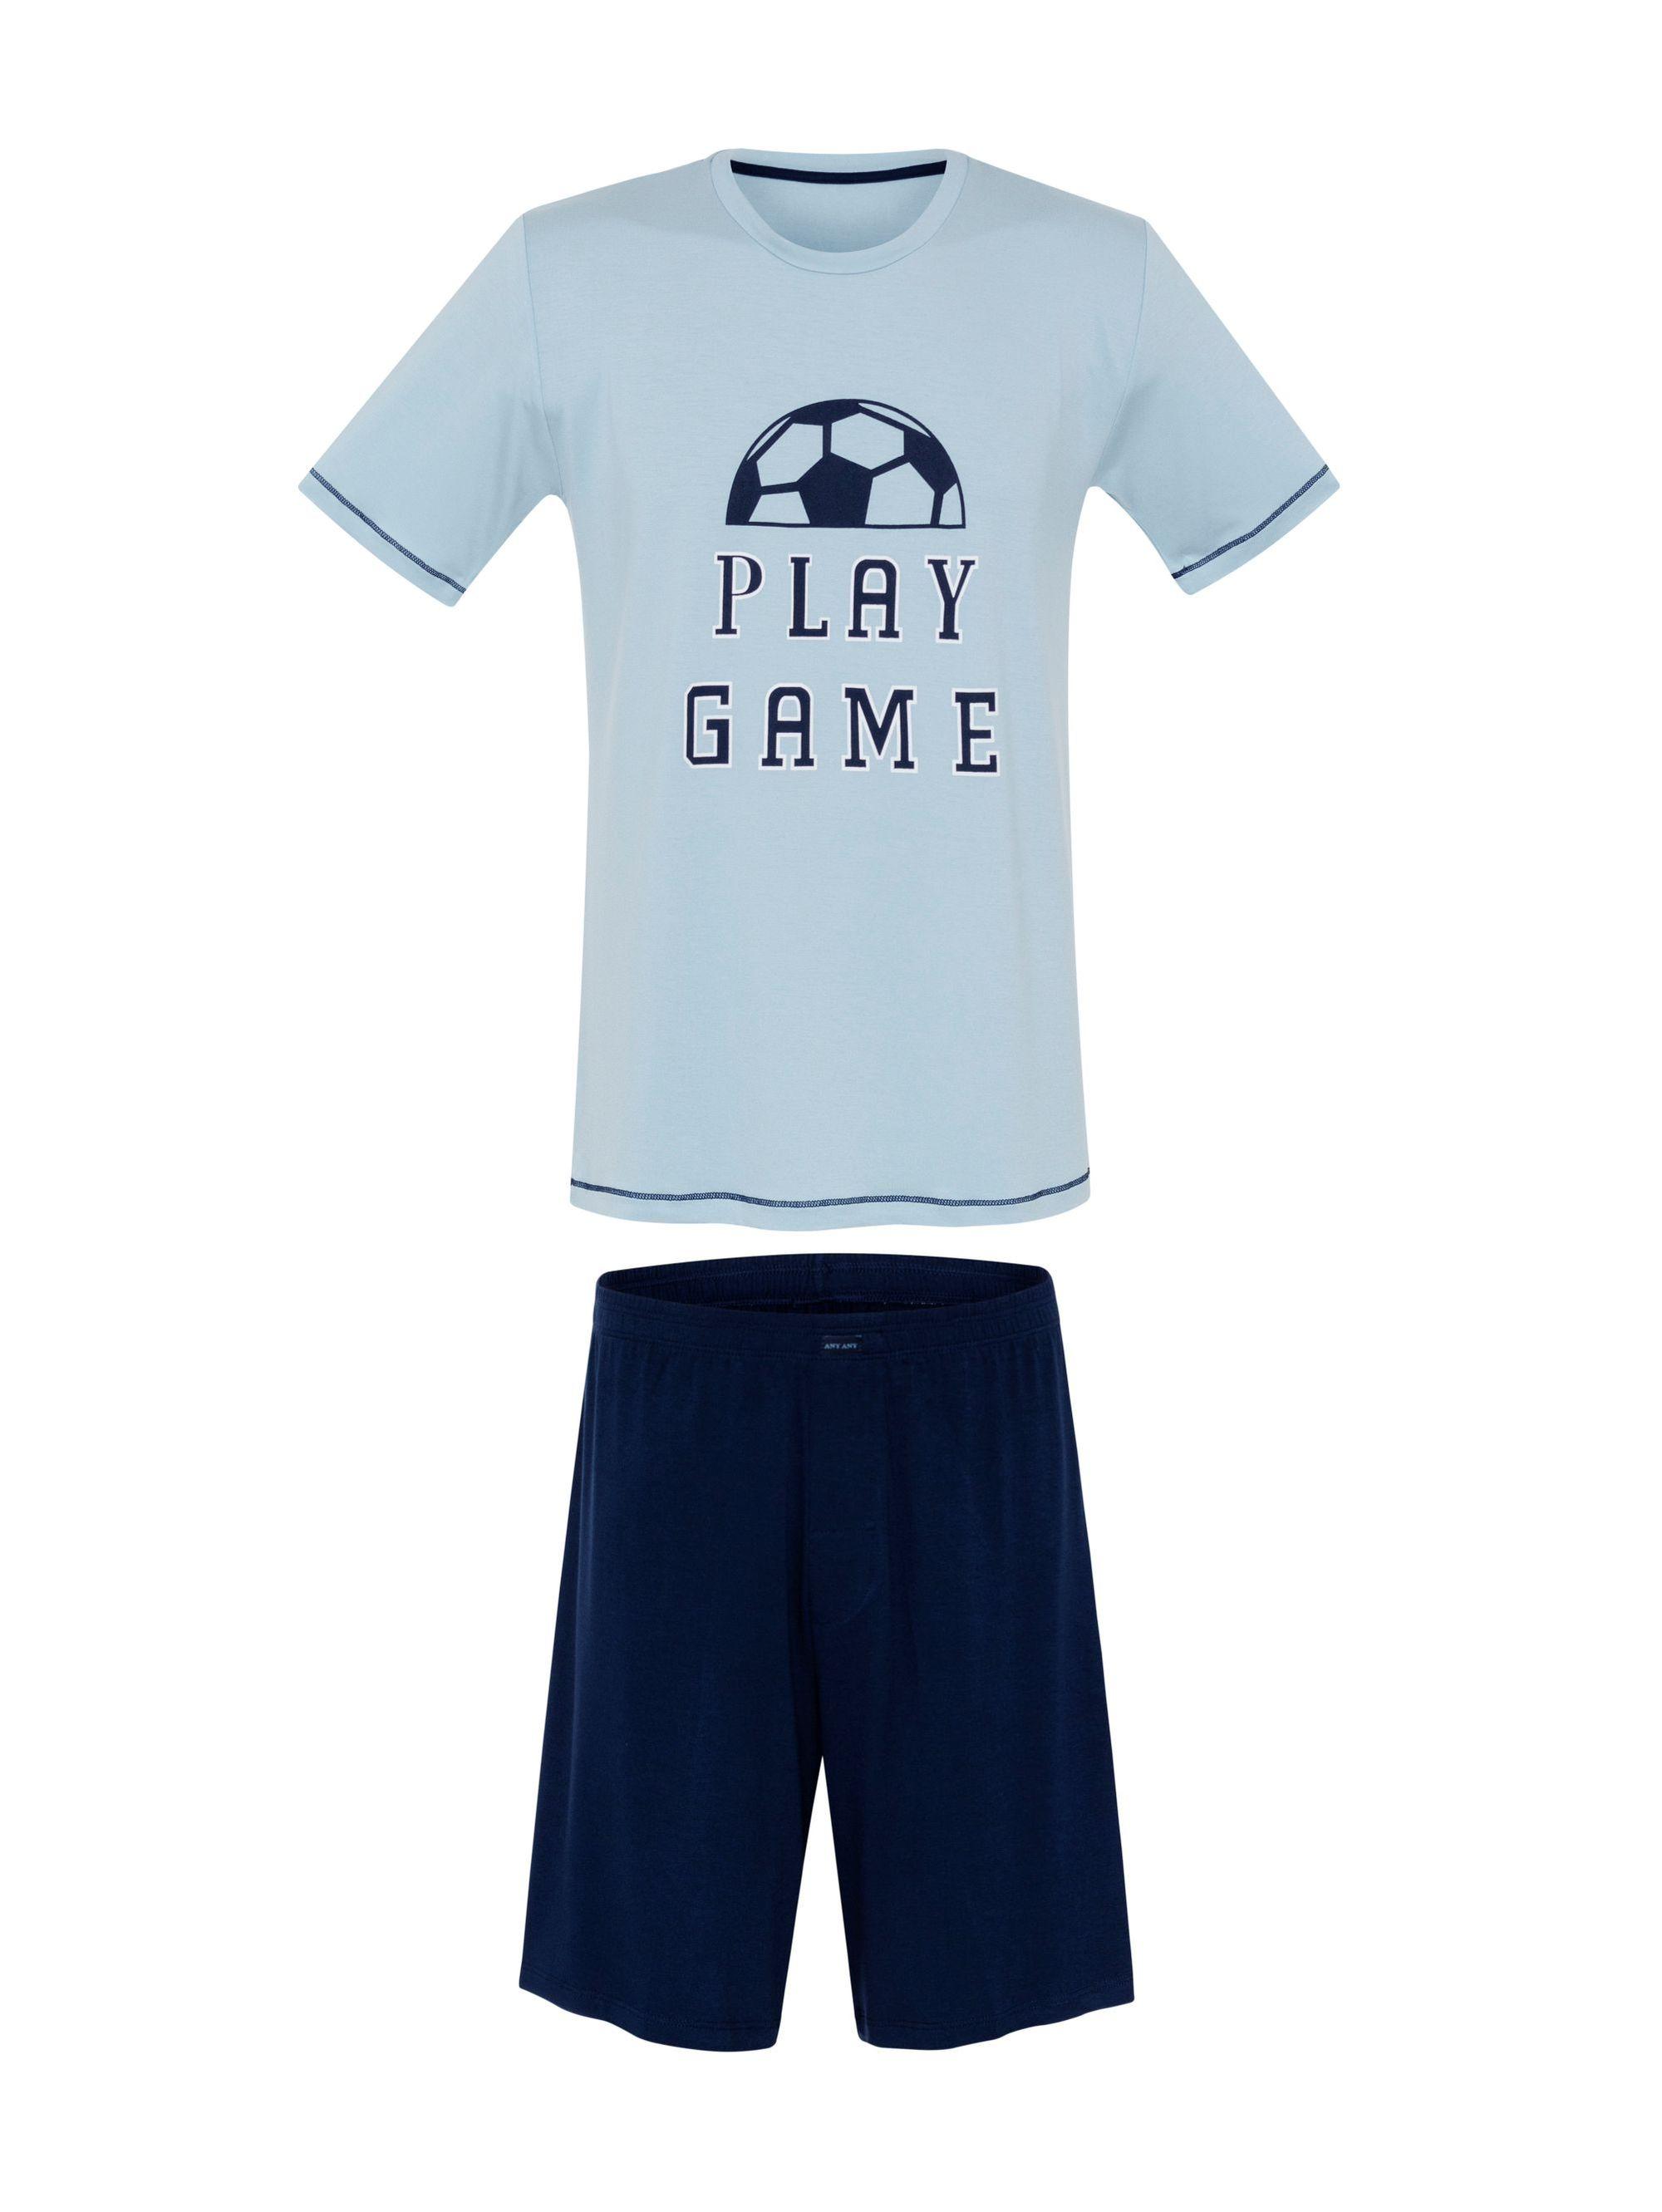 Pijama-Curto-Manga-Curta-Play-Game---04020725